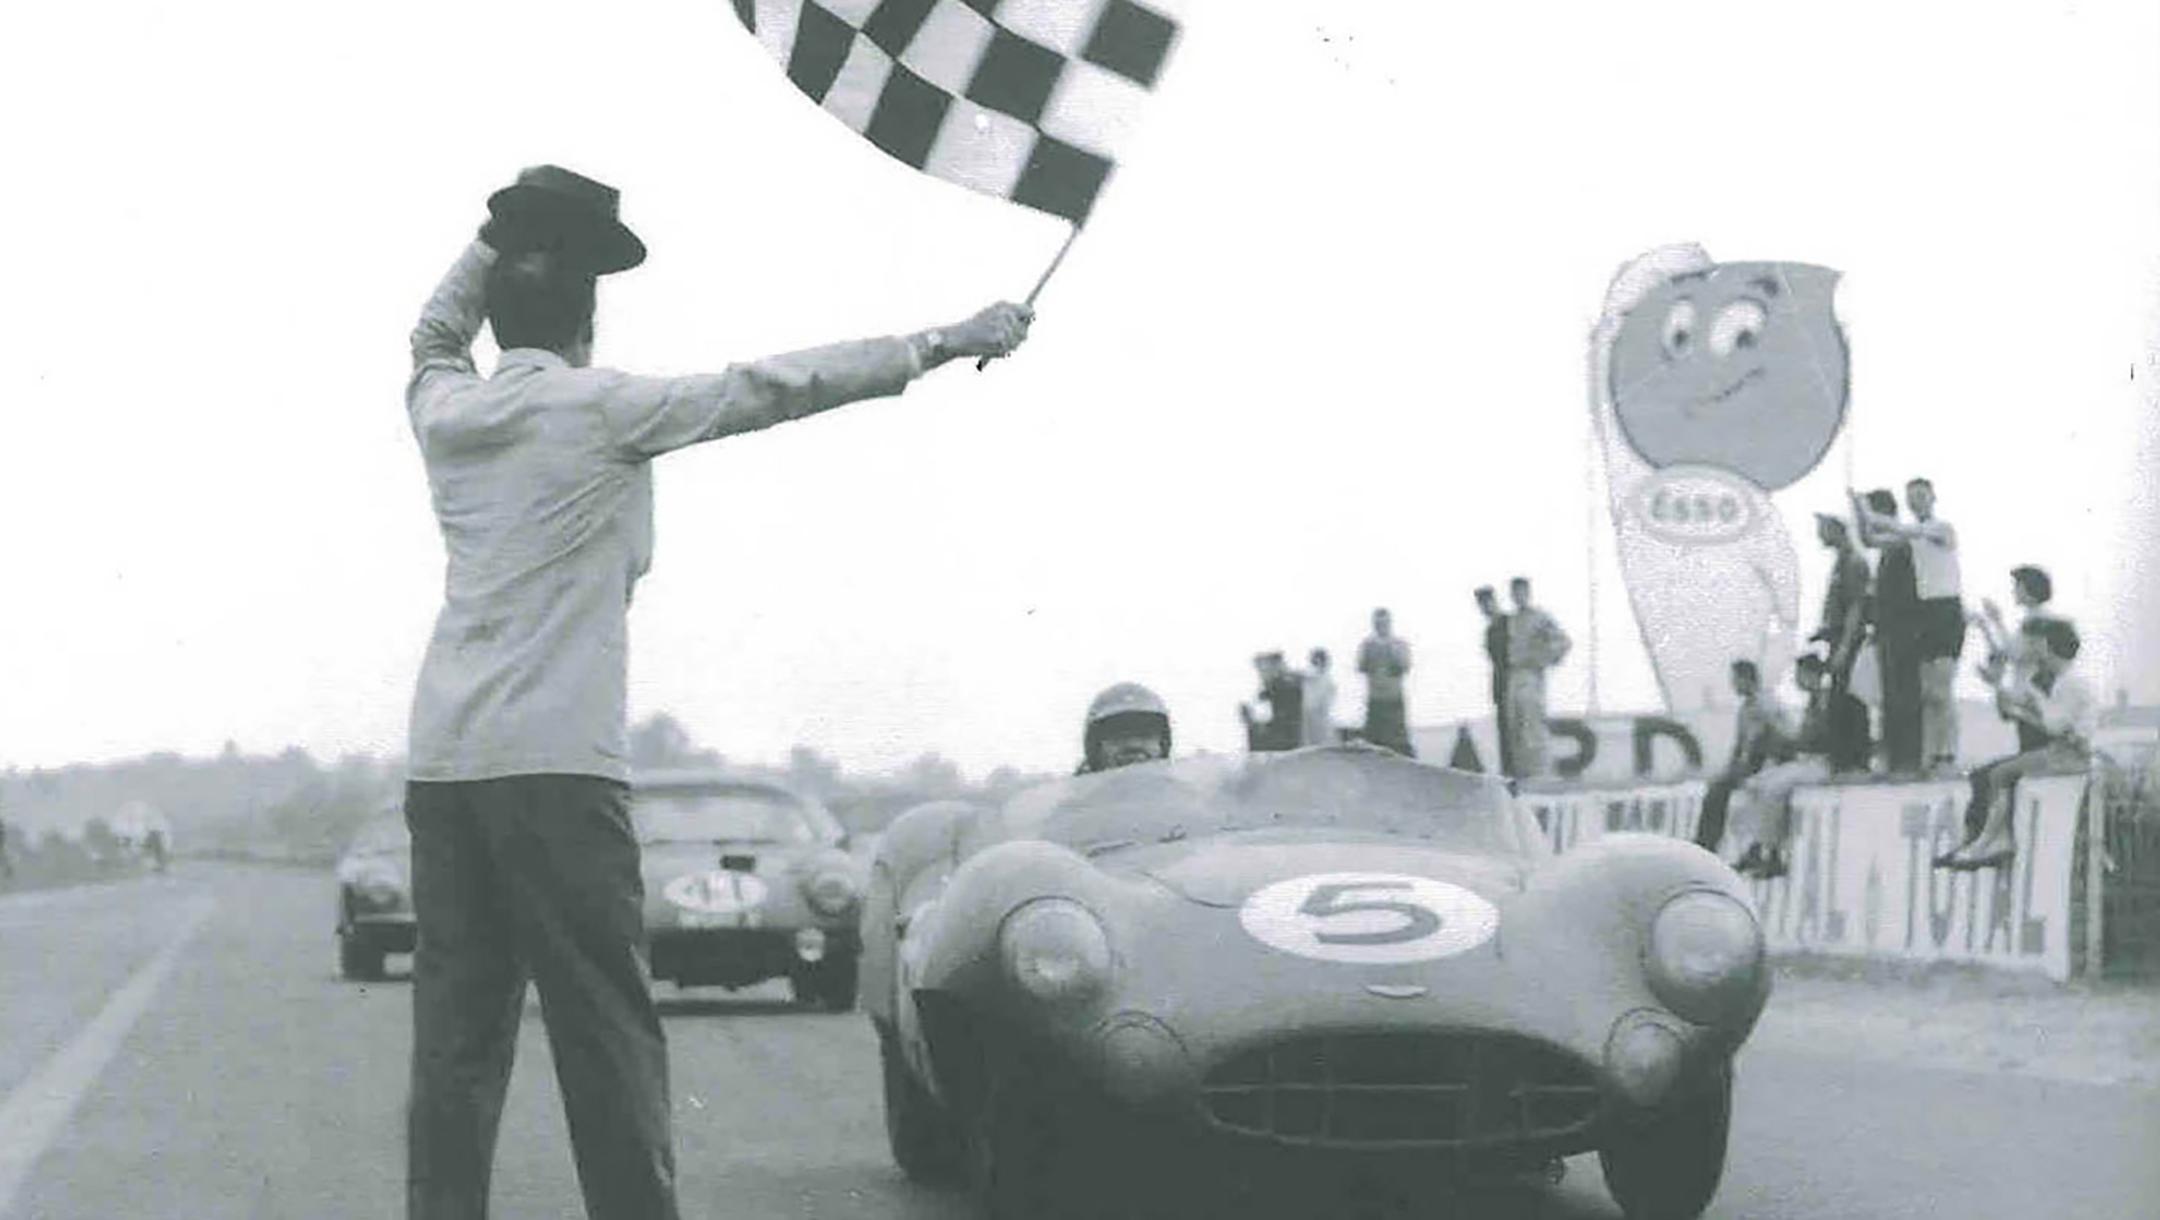 Carroll Shelby - Aston Martin - finish line Le Mans - 1959 - heritage photography - via Shelby America